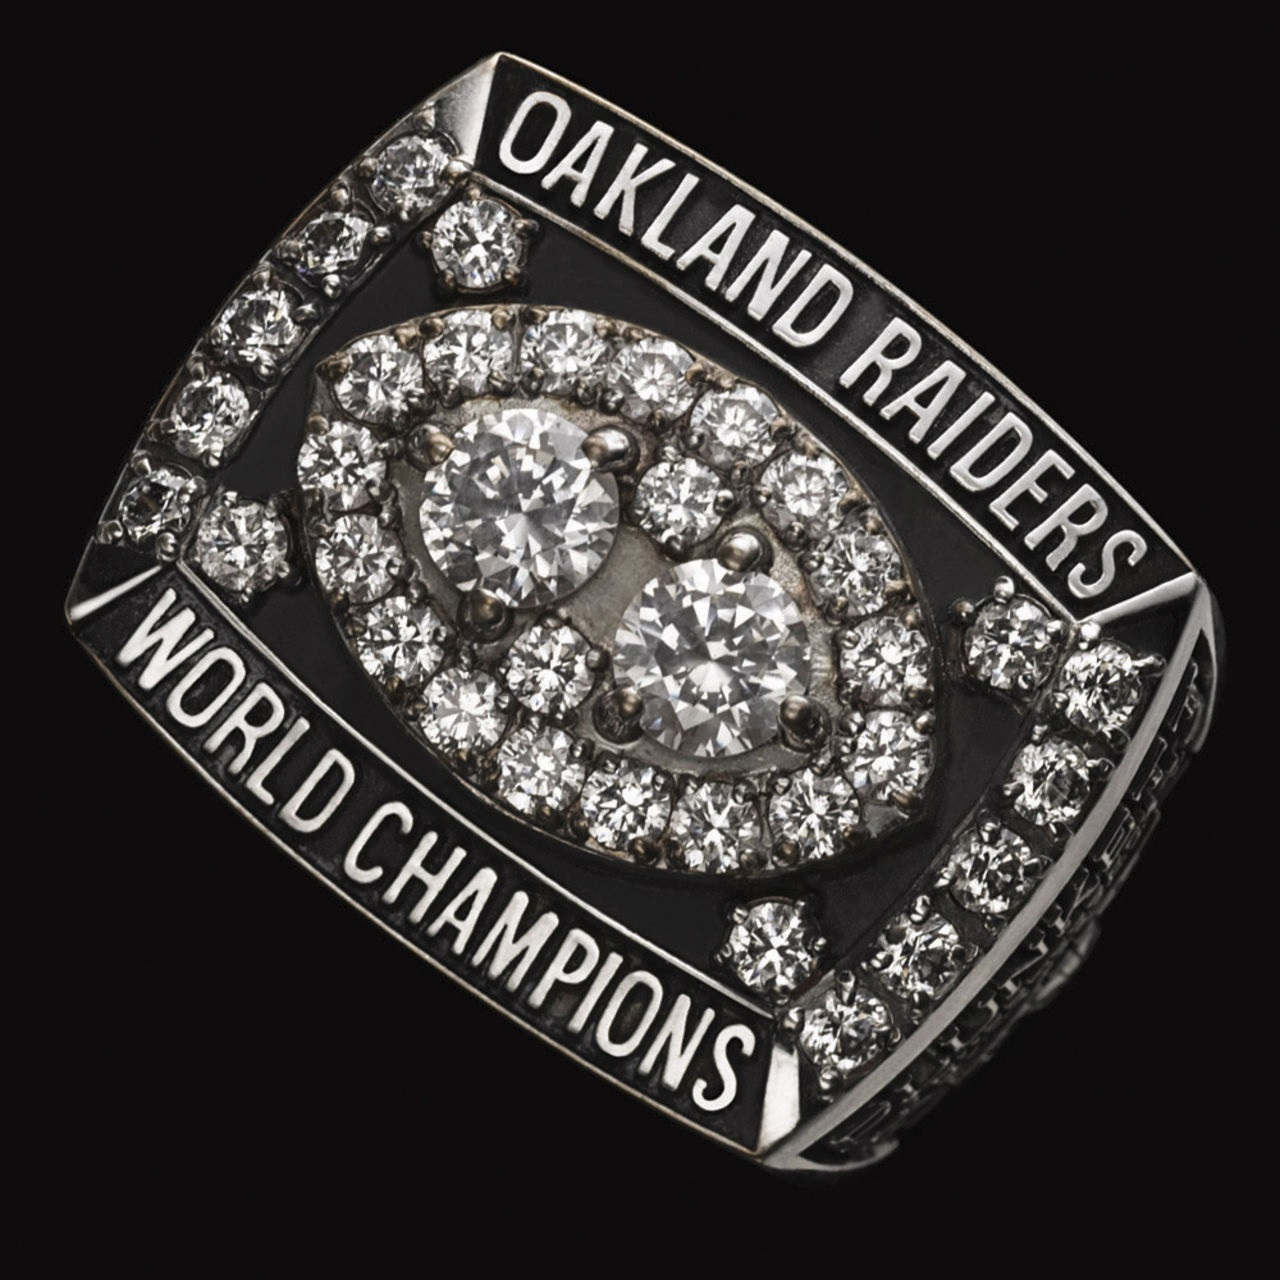 Oackland Raiders 1981 champions ring